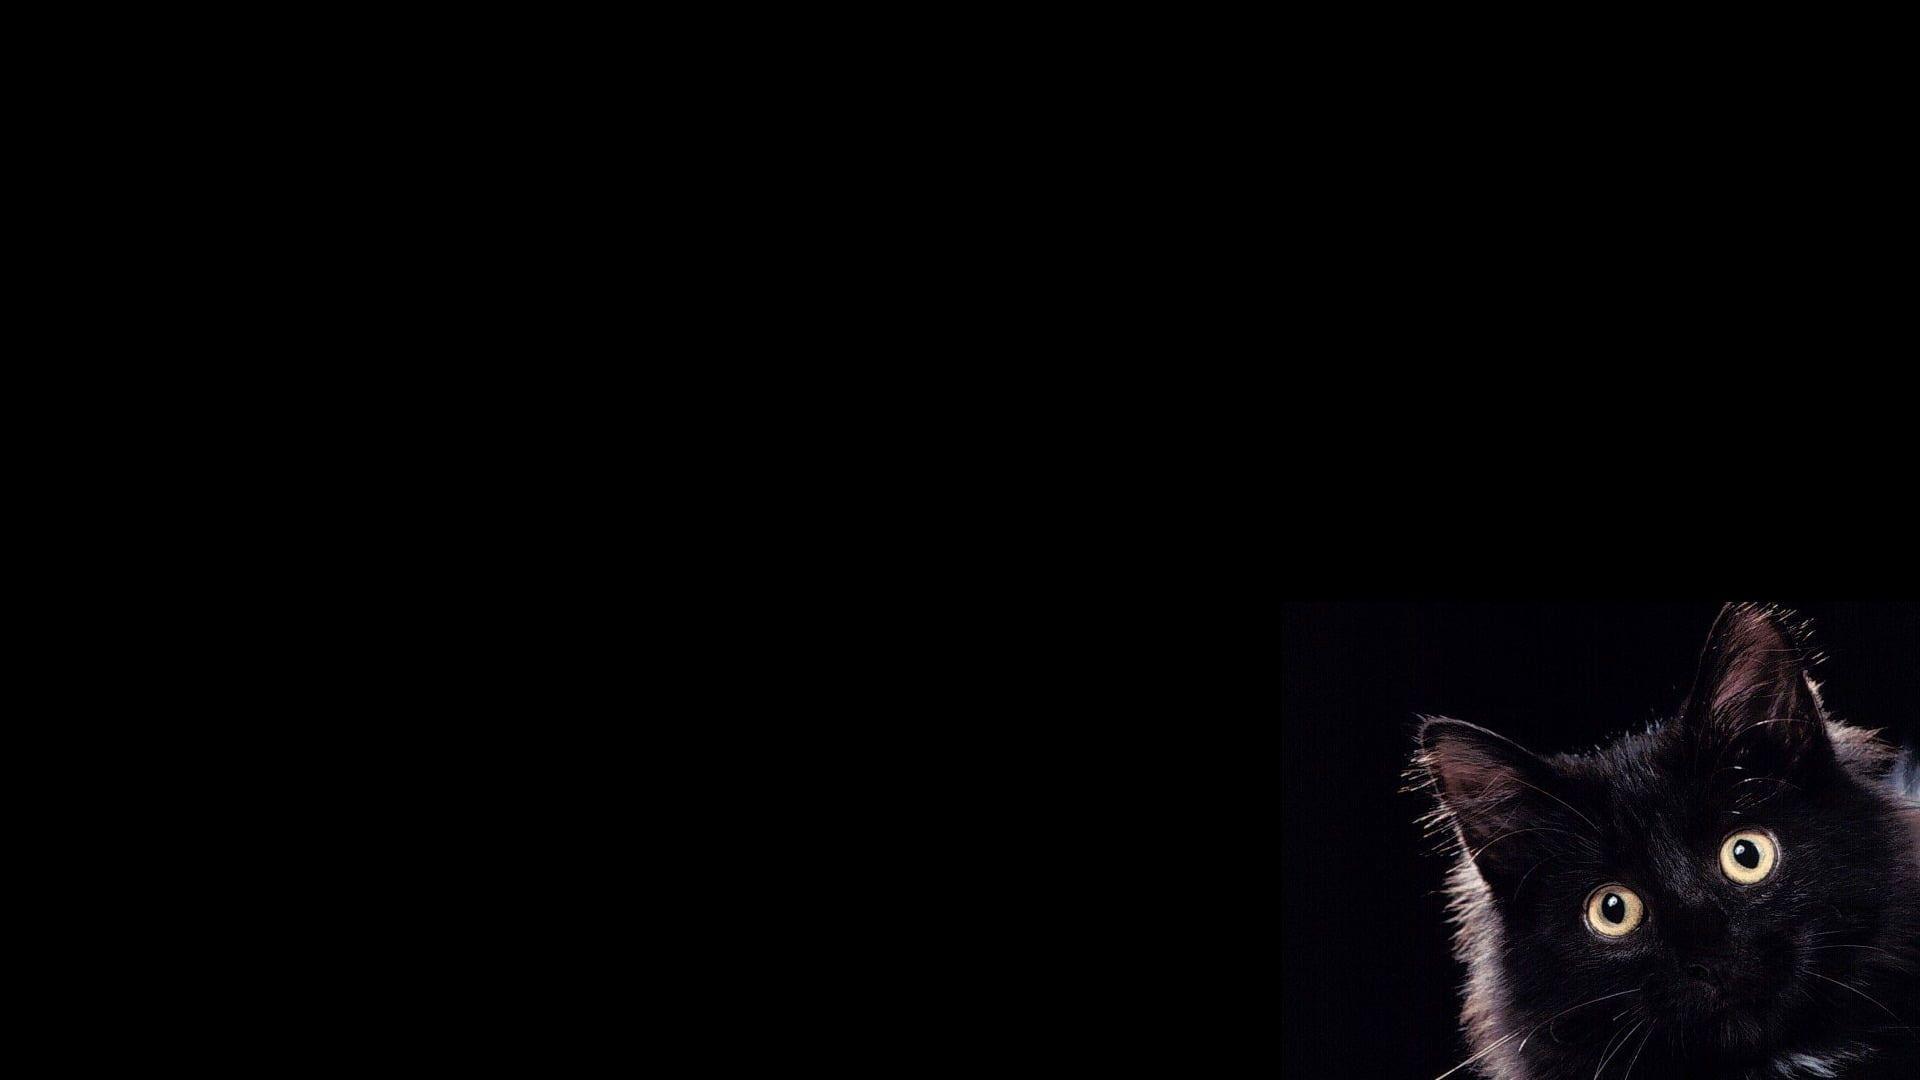 Black Cat Wallpaper Pets Animal Themes Domestic Domestic Cat Domestic Animals Cat Wallpaper Domestic Cat Cat Dark